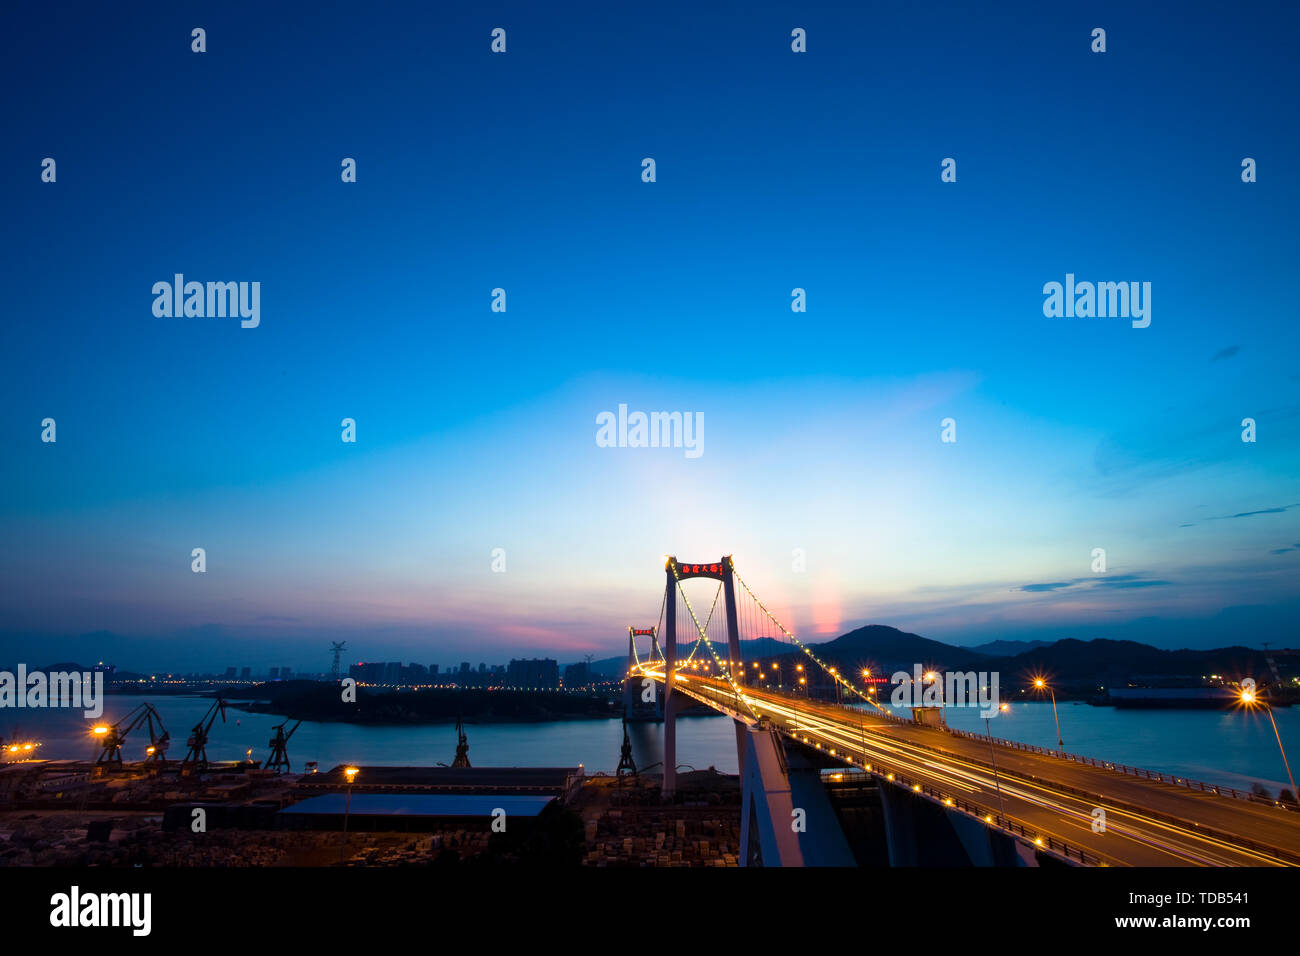 bridge over sea at night in xiamen - Stock Image